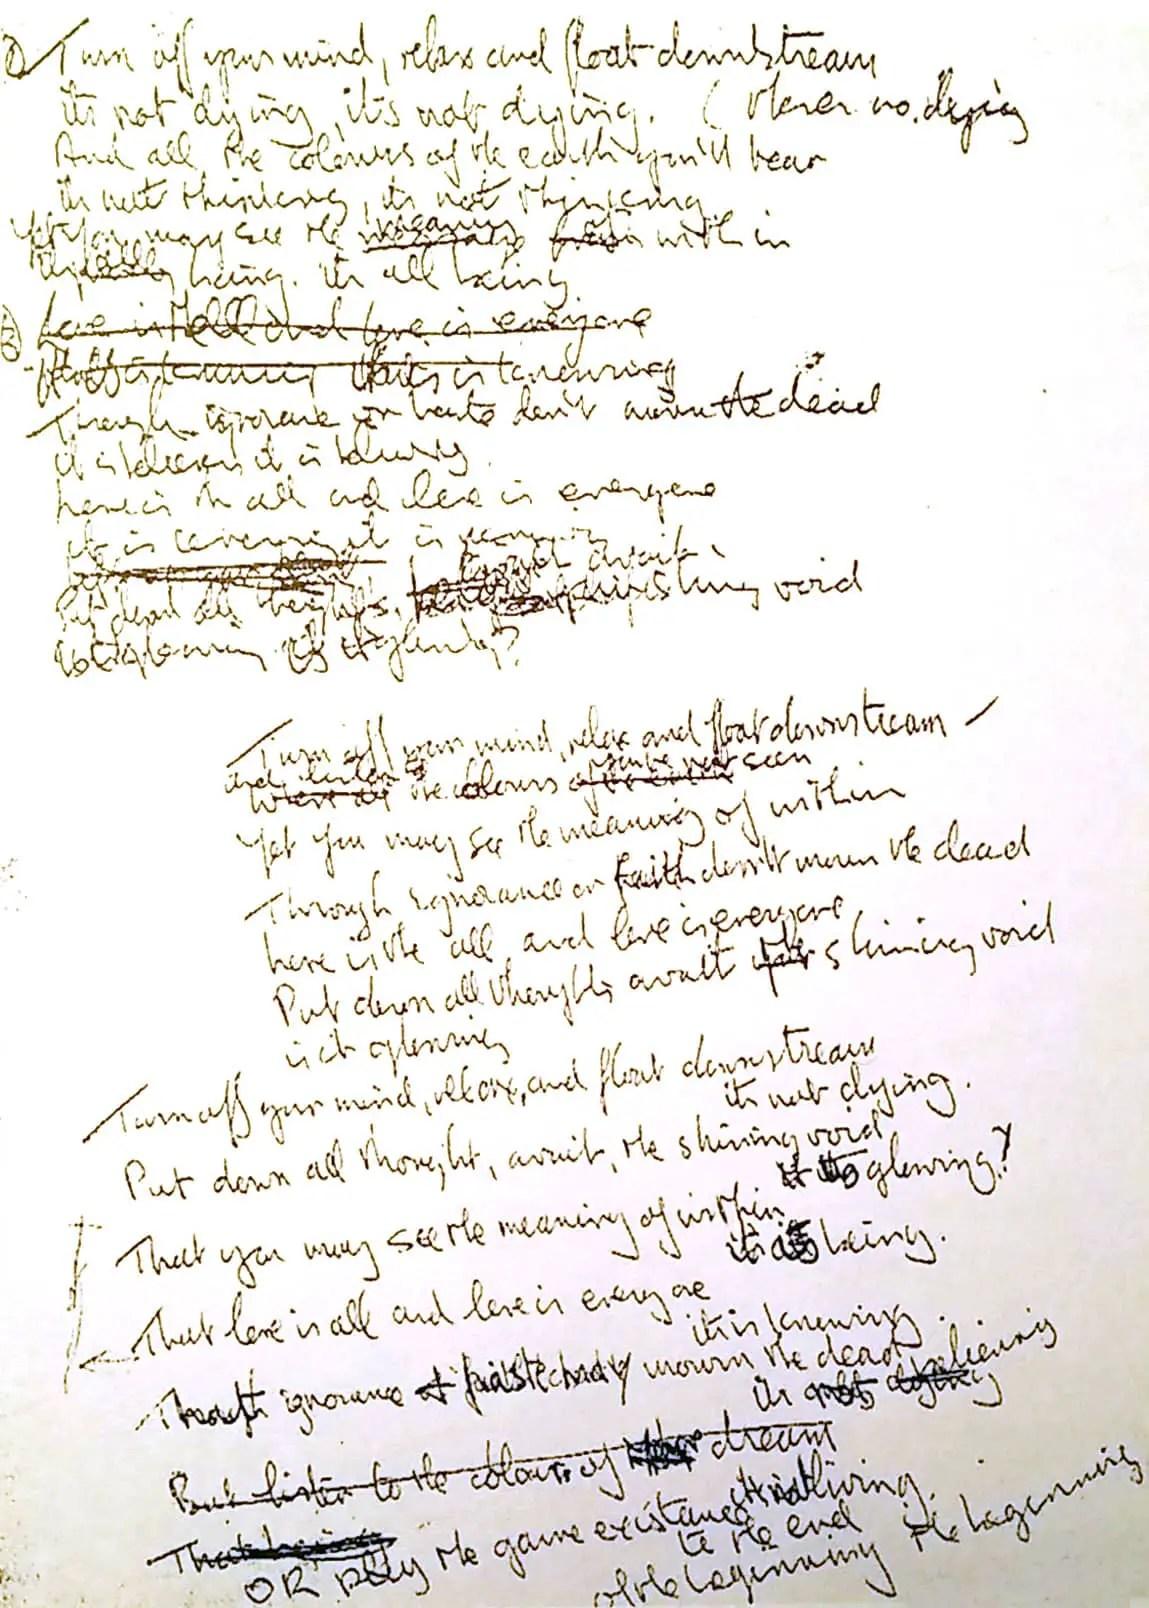 John Lennons Lyrics For The Beatles Song Tomorrow Never Knows